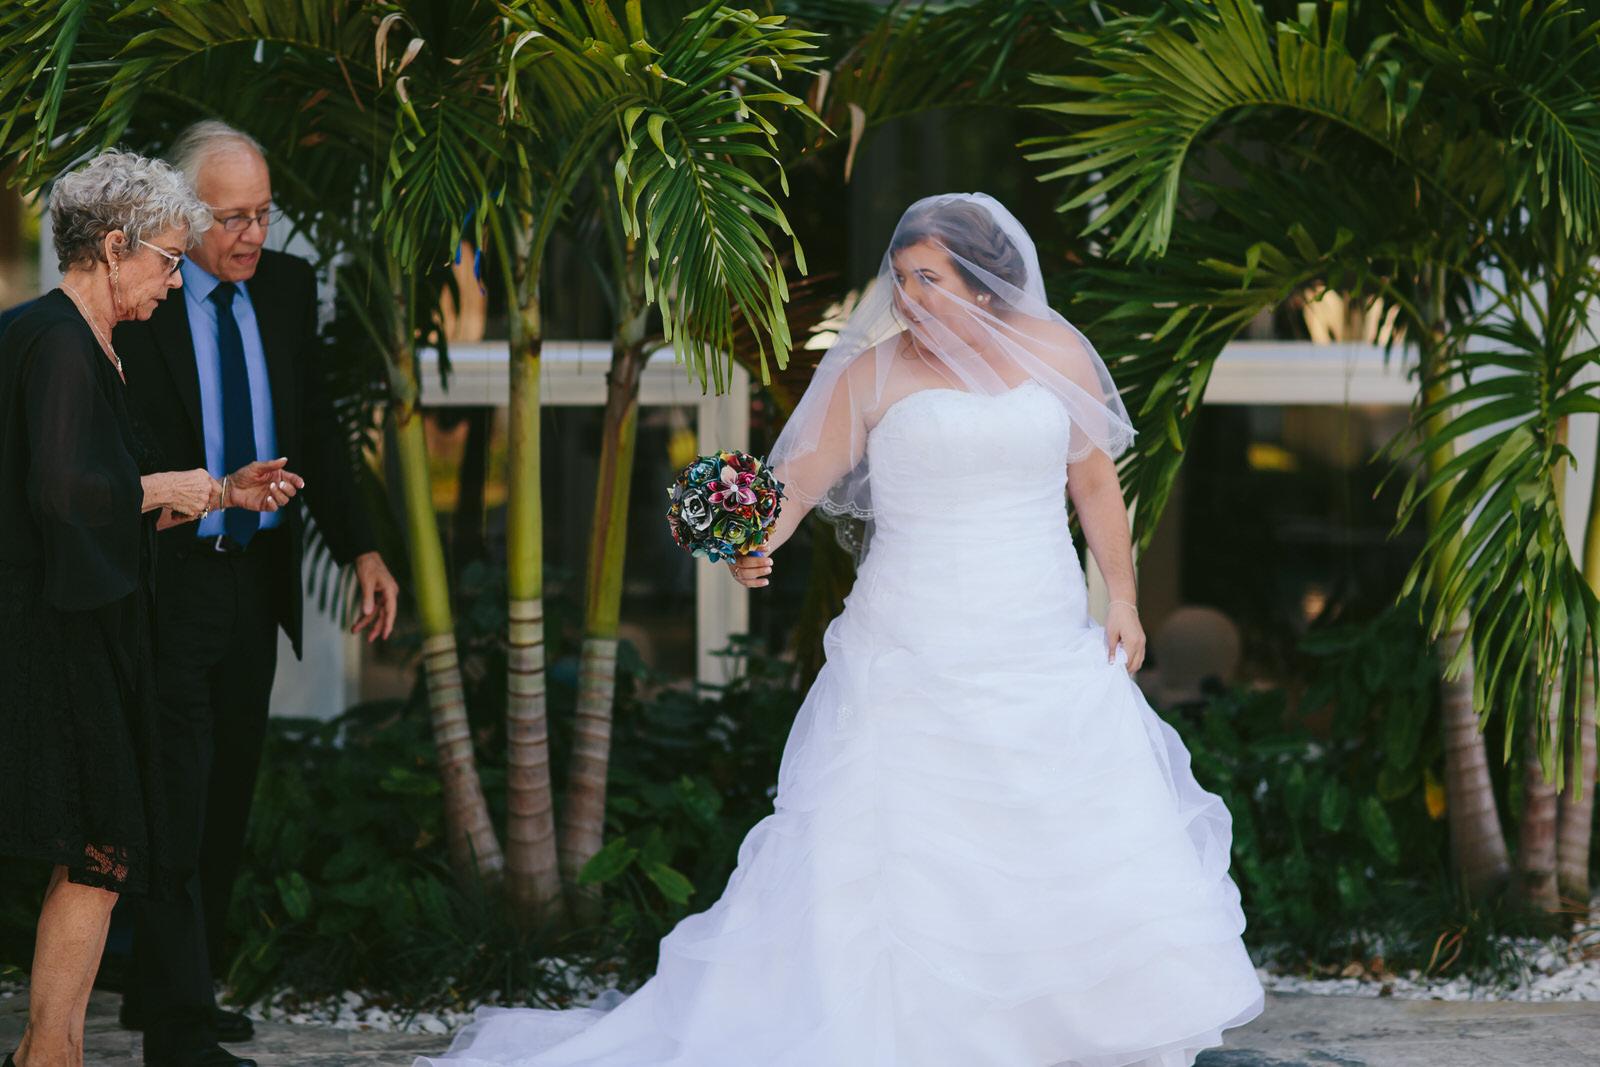 bride-walking-ceremony-tiny-house-photo.jpg